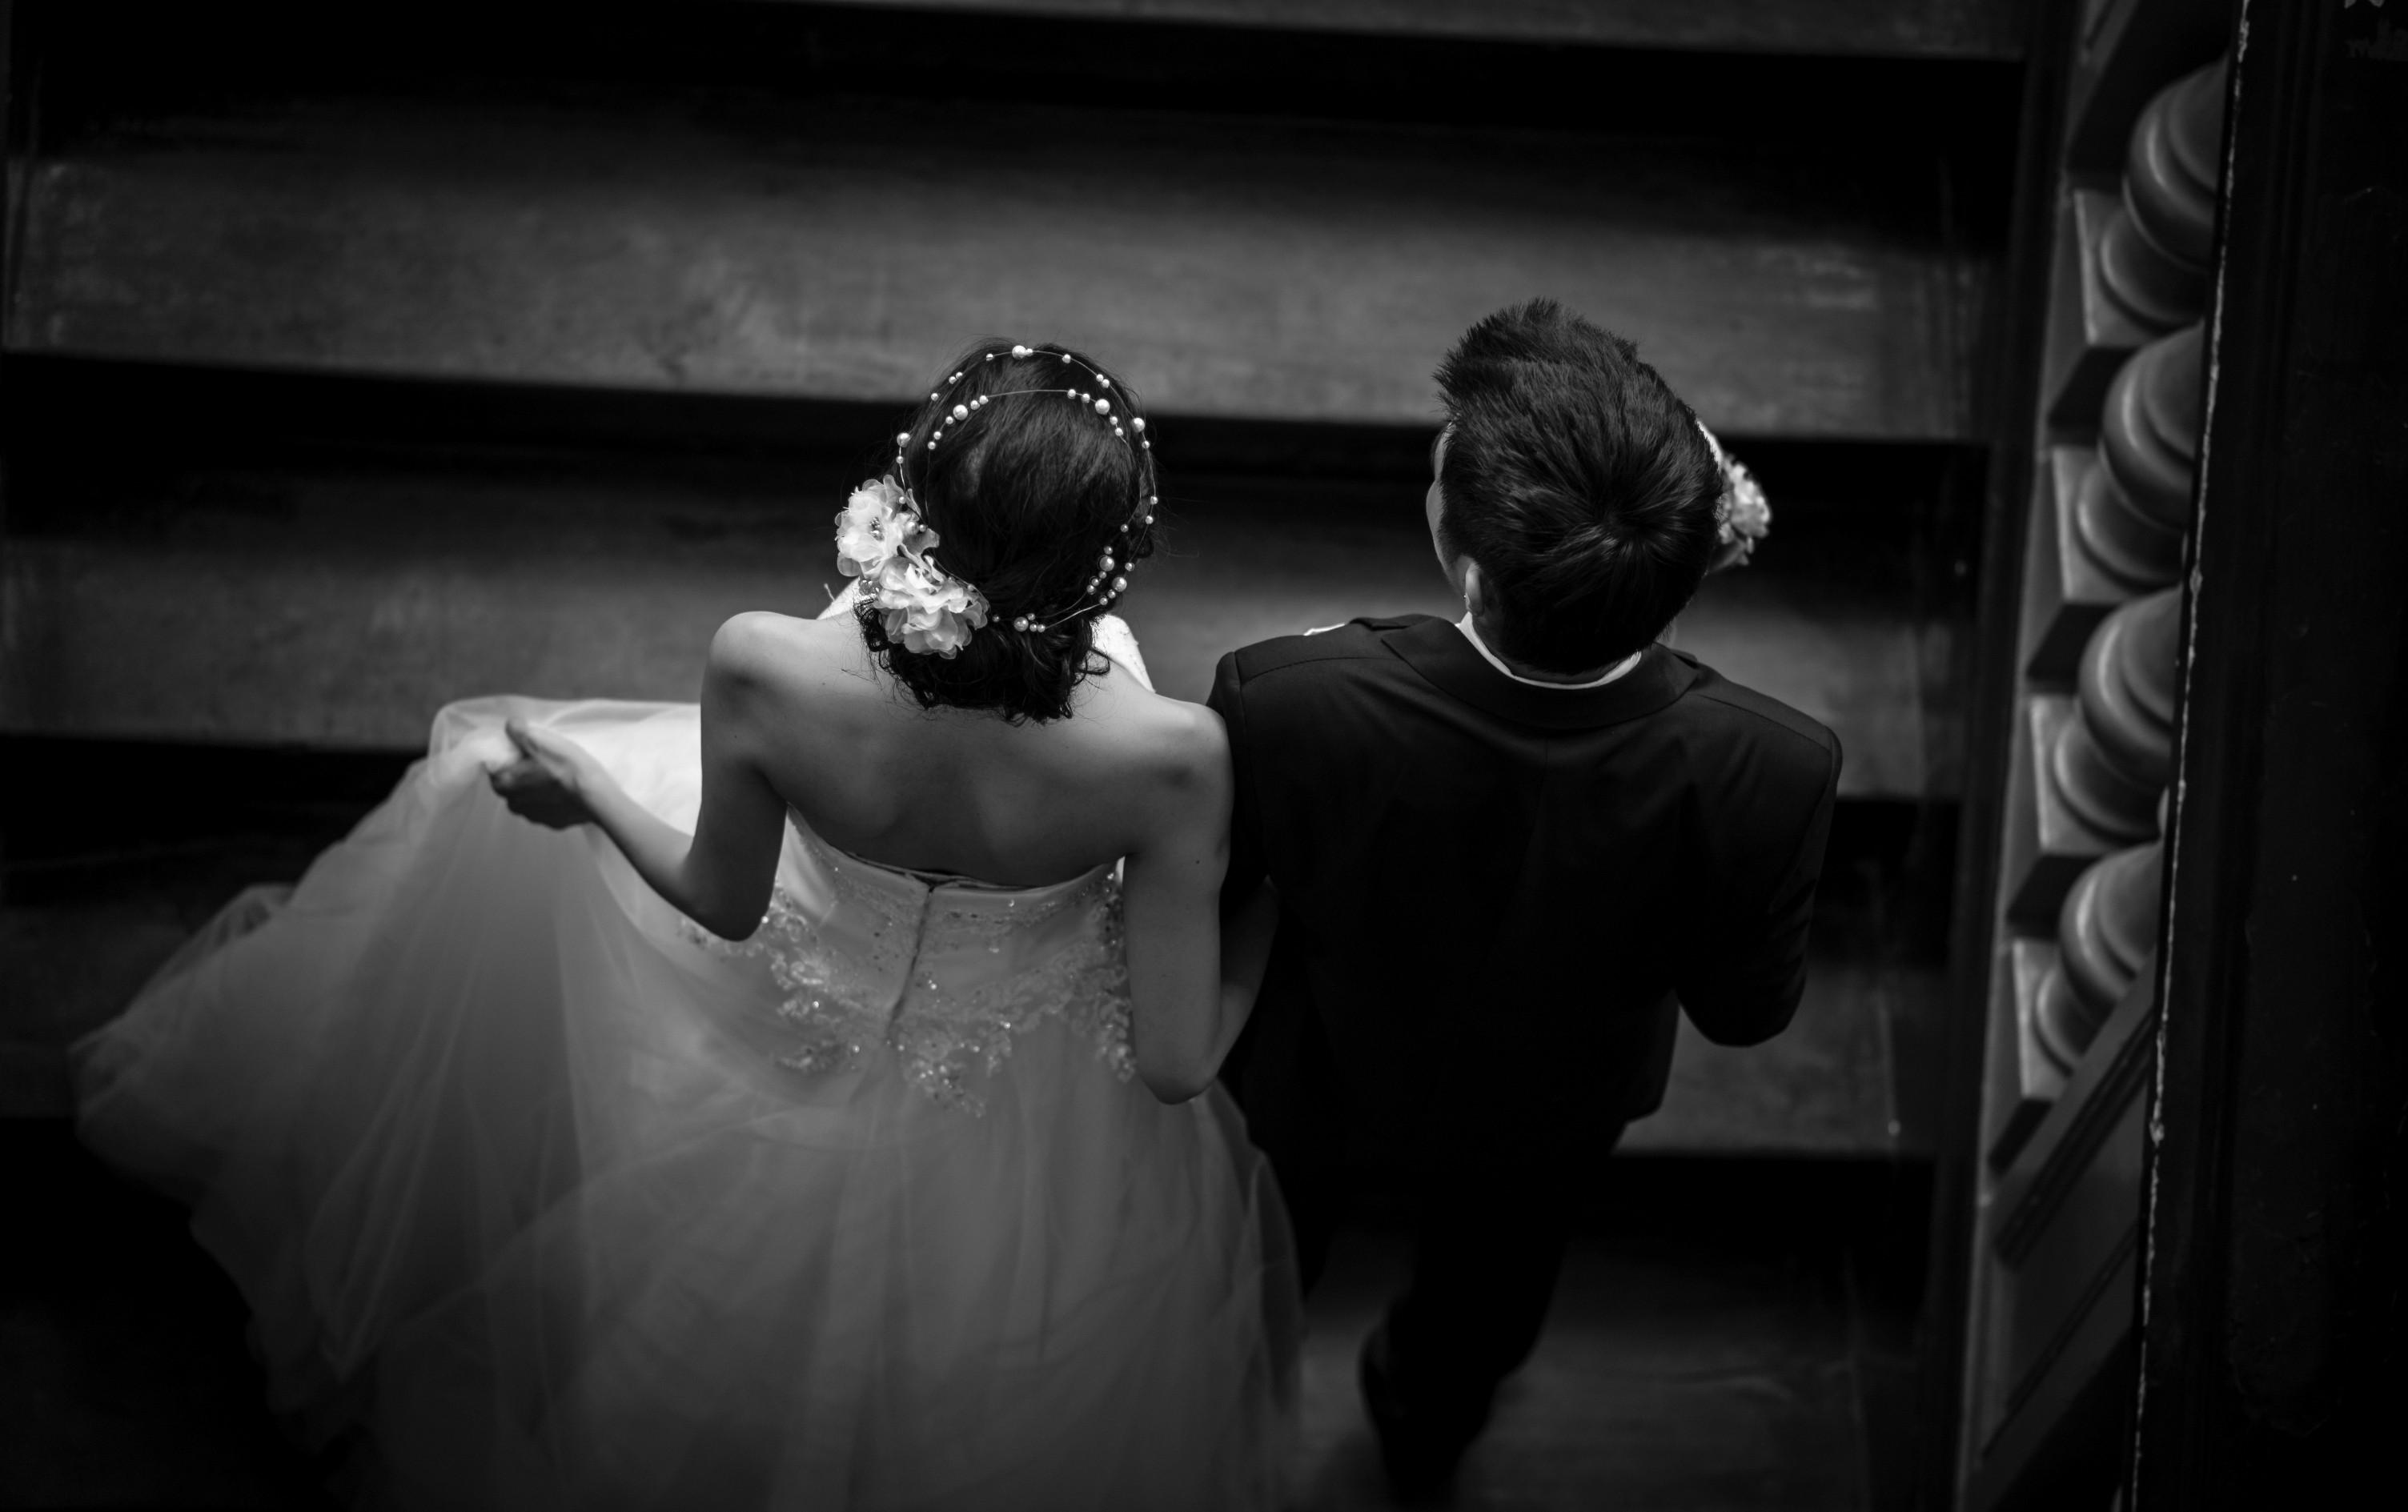 men-black-women-wedding-photography